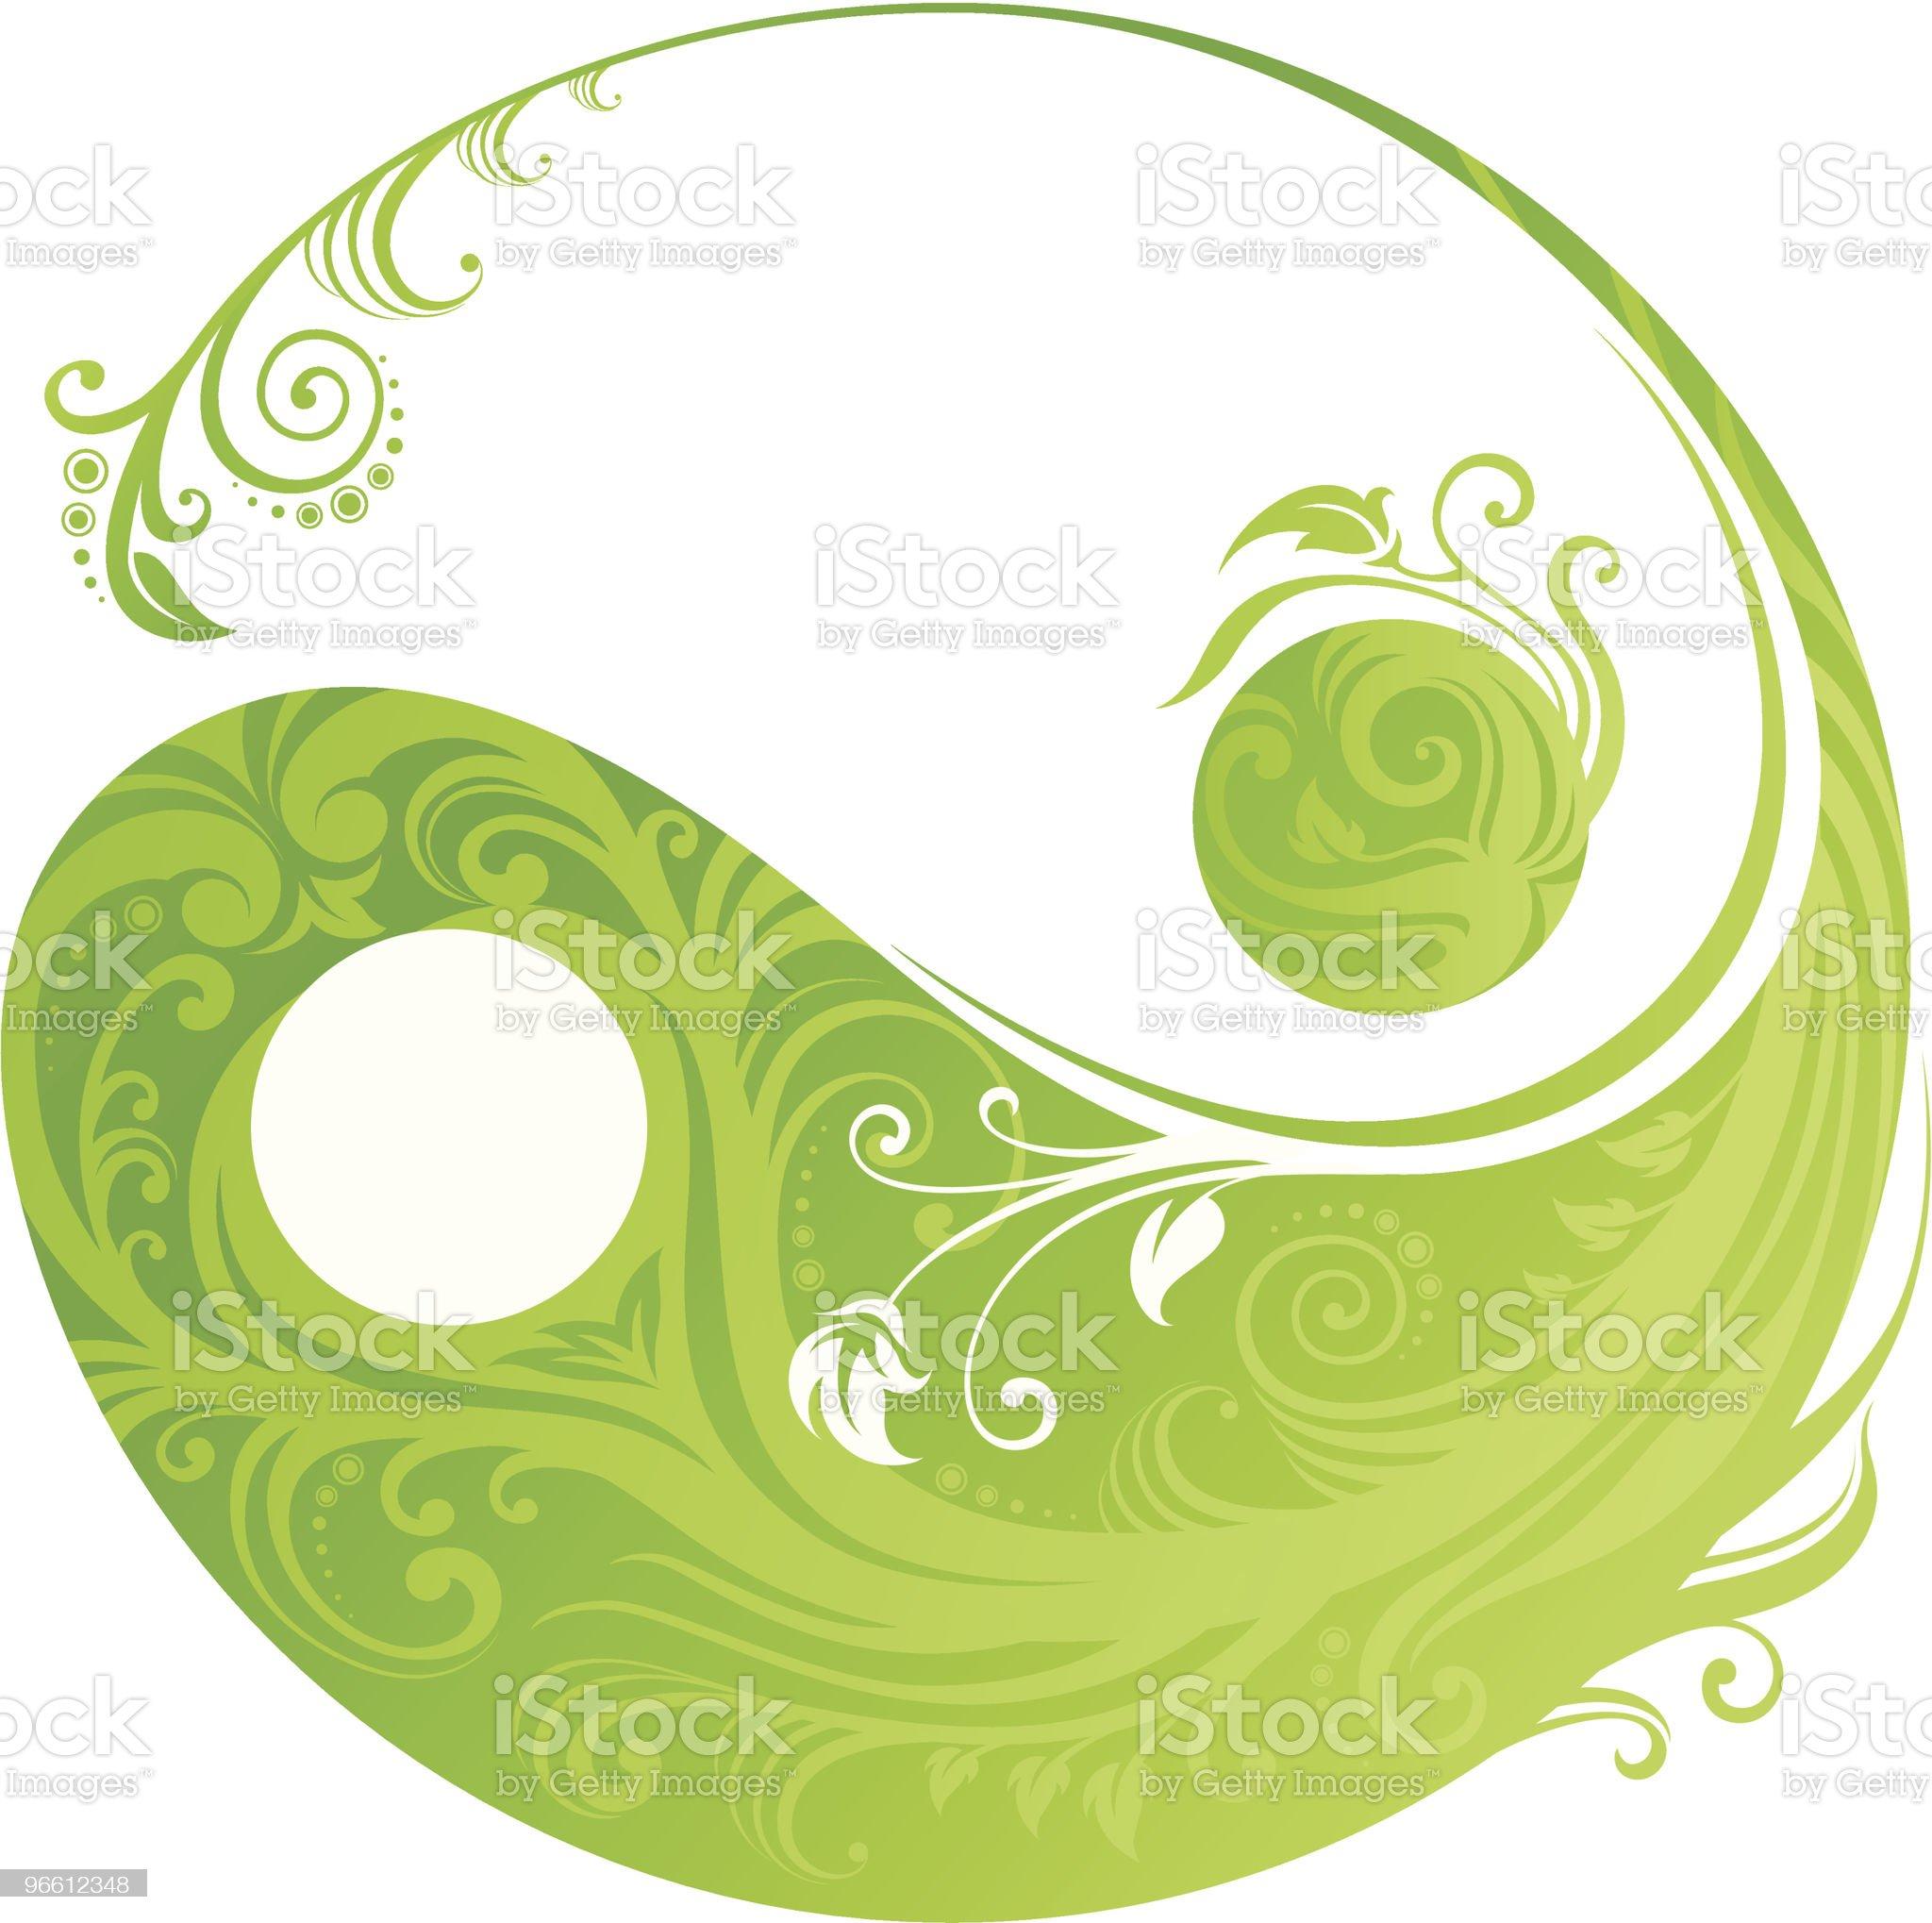 Floral yinyang symbol royalty-free stock vector art